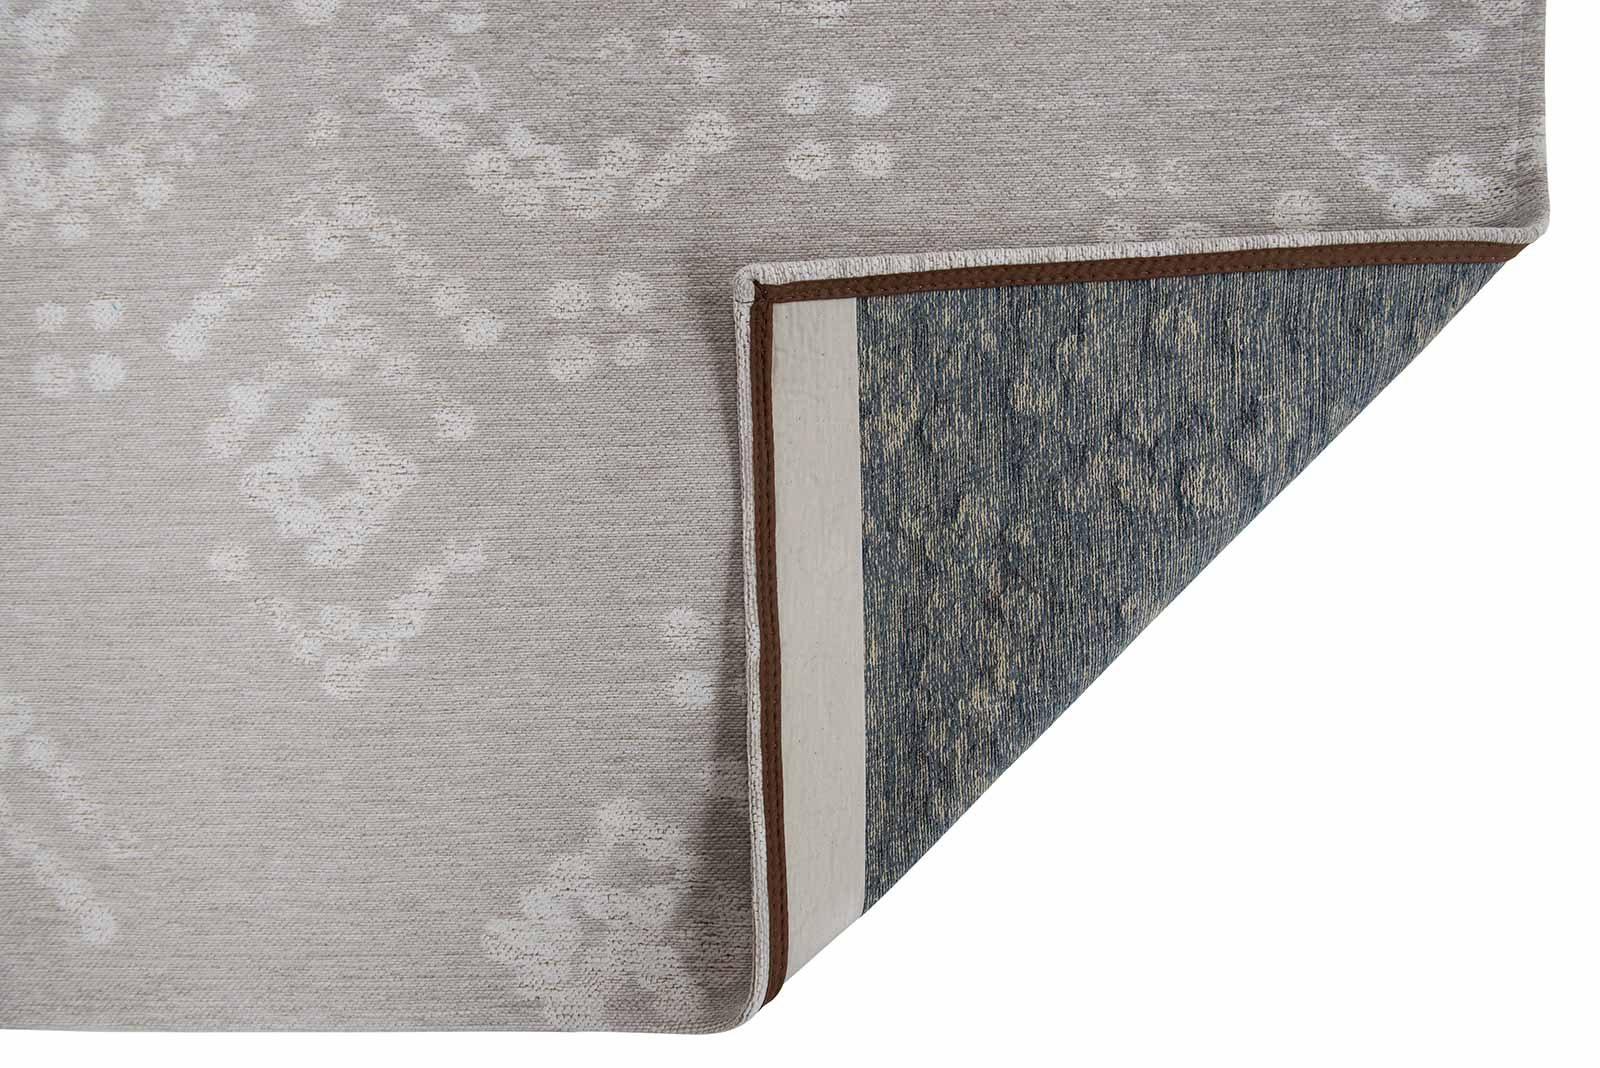 Louis De Poortere rugs Villa Nova LX 8759 Marit Rice back